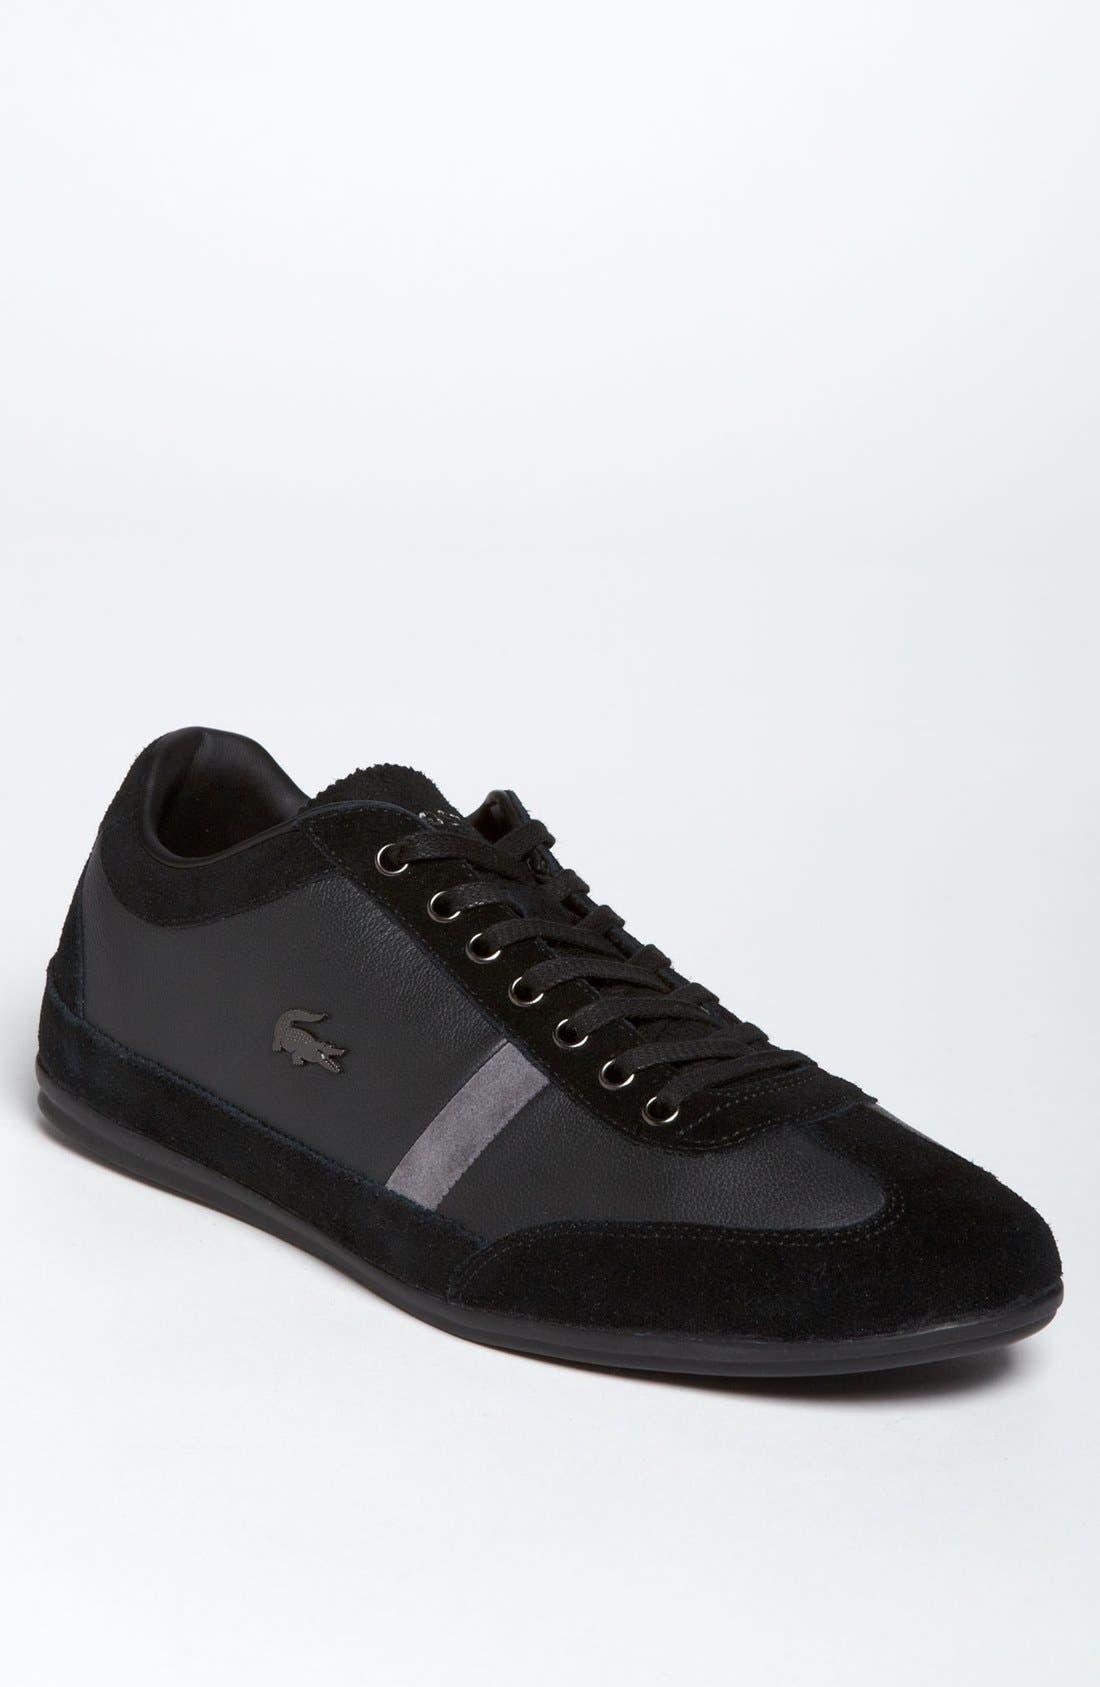 Alternate Image 1 Selected - Lacoste 'Misano 22' Sneaker